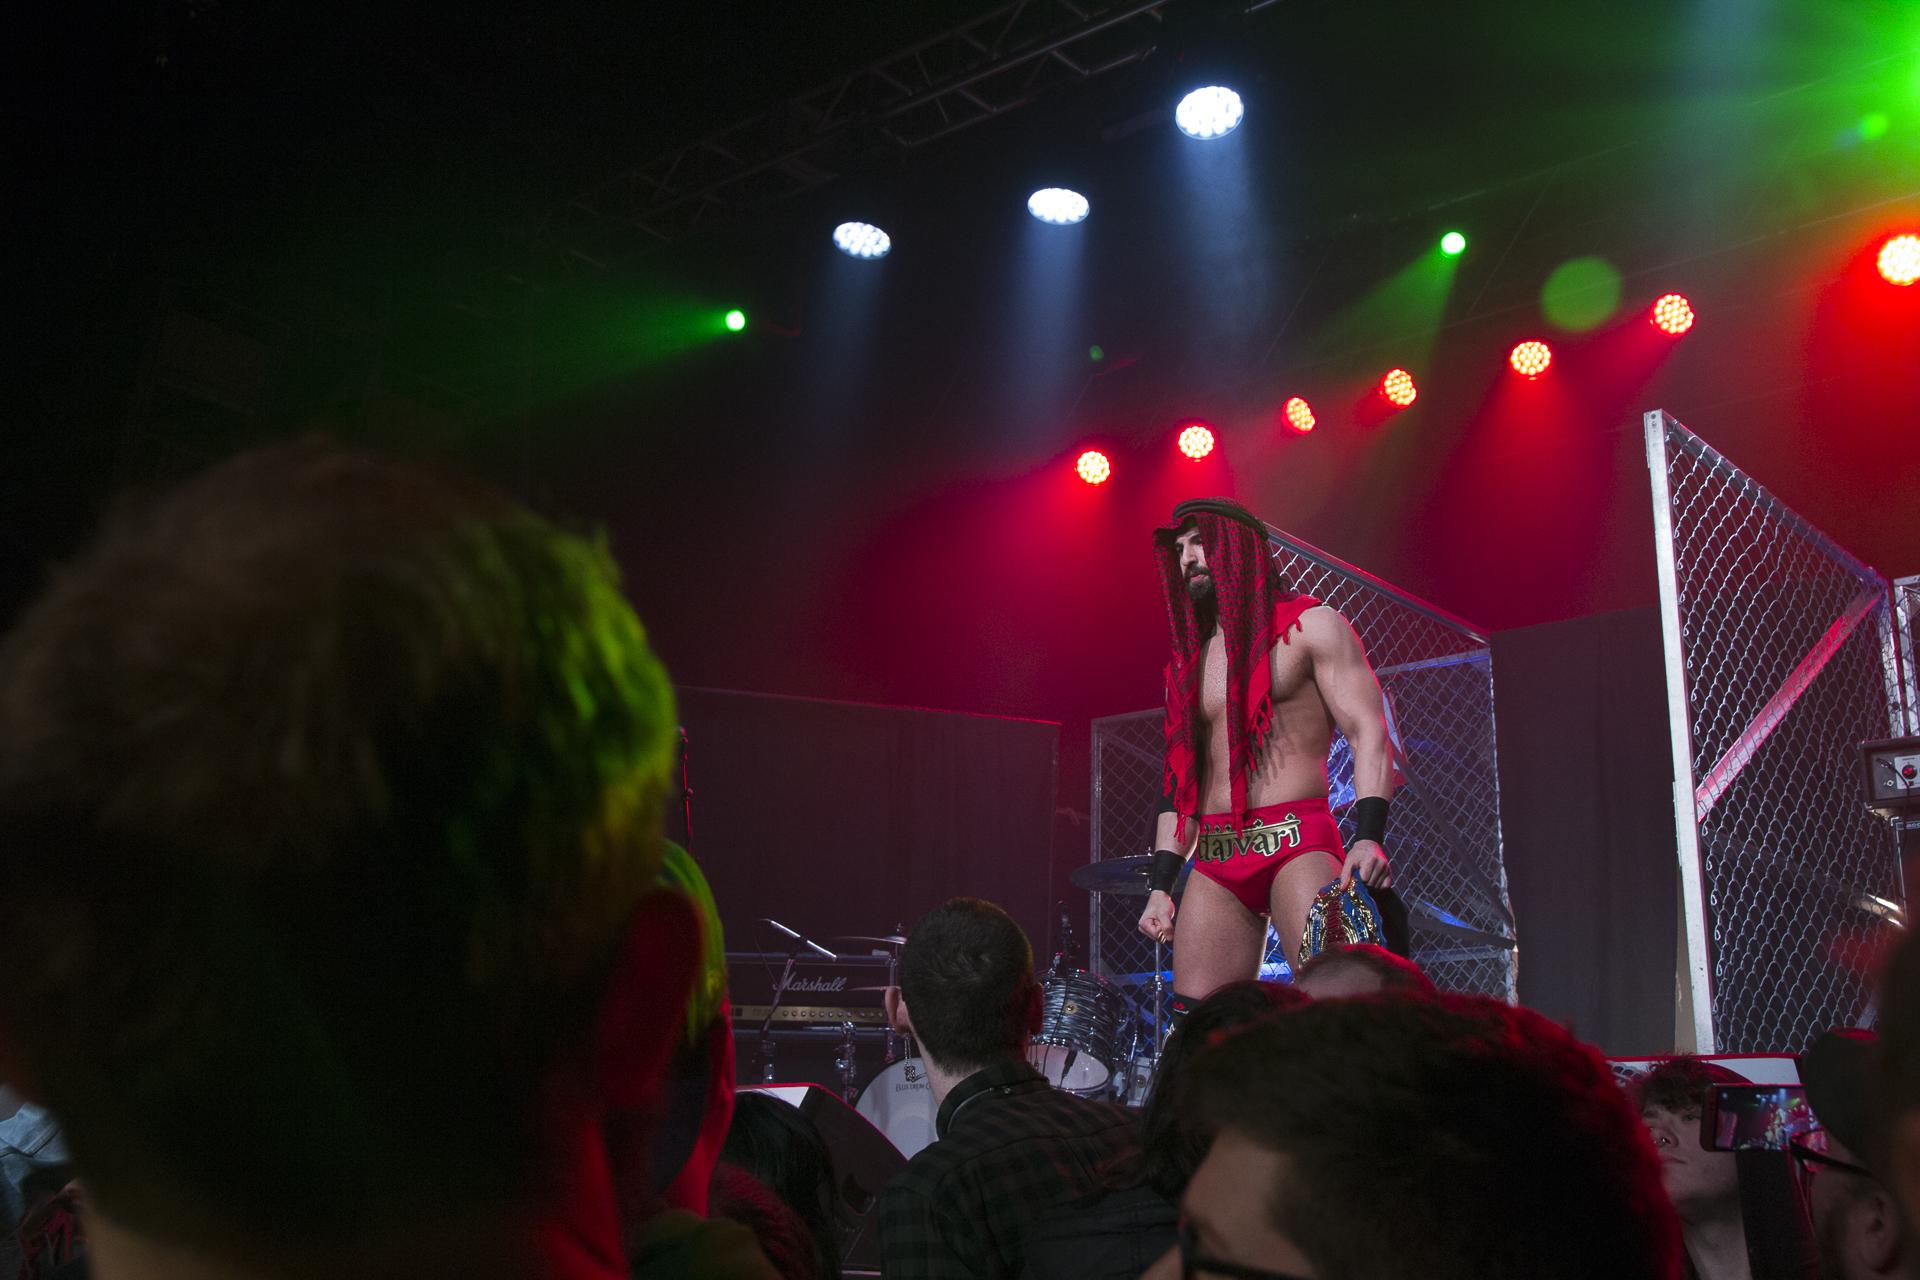 wrestlepalooza-wrestling-30.jpg